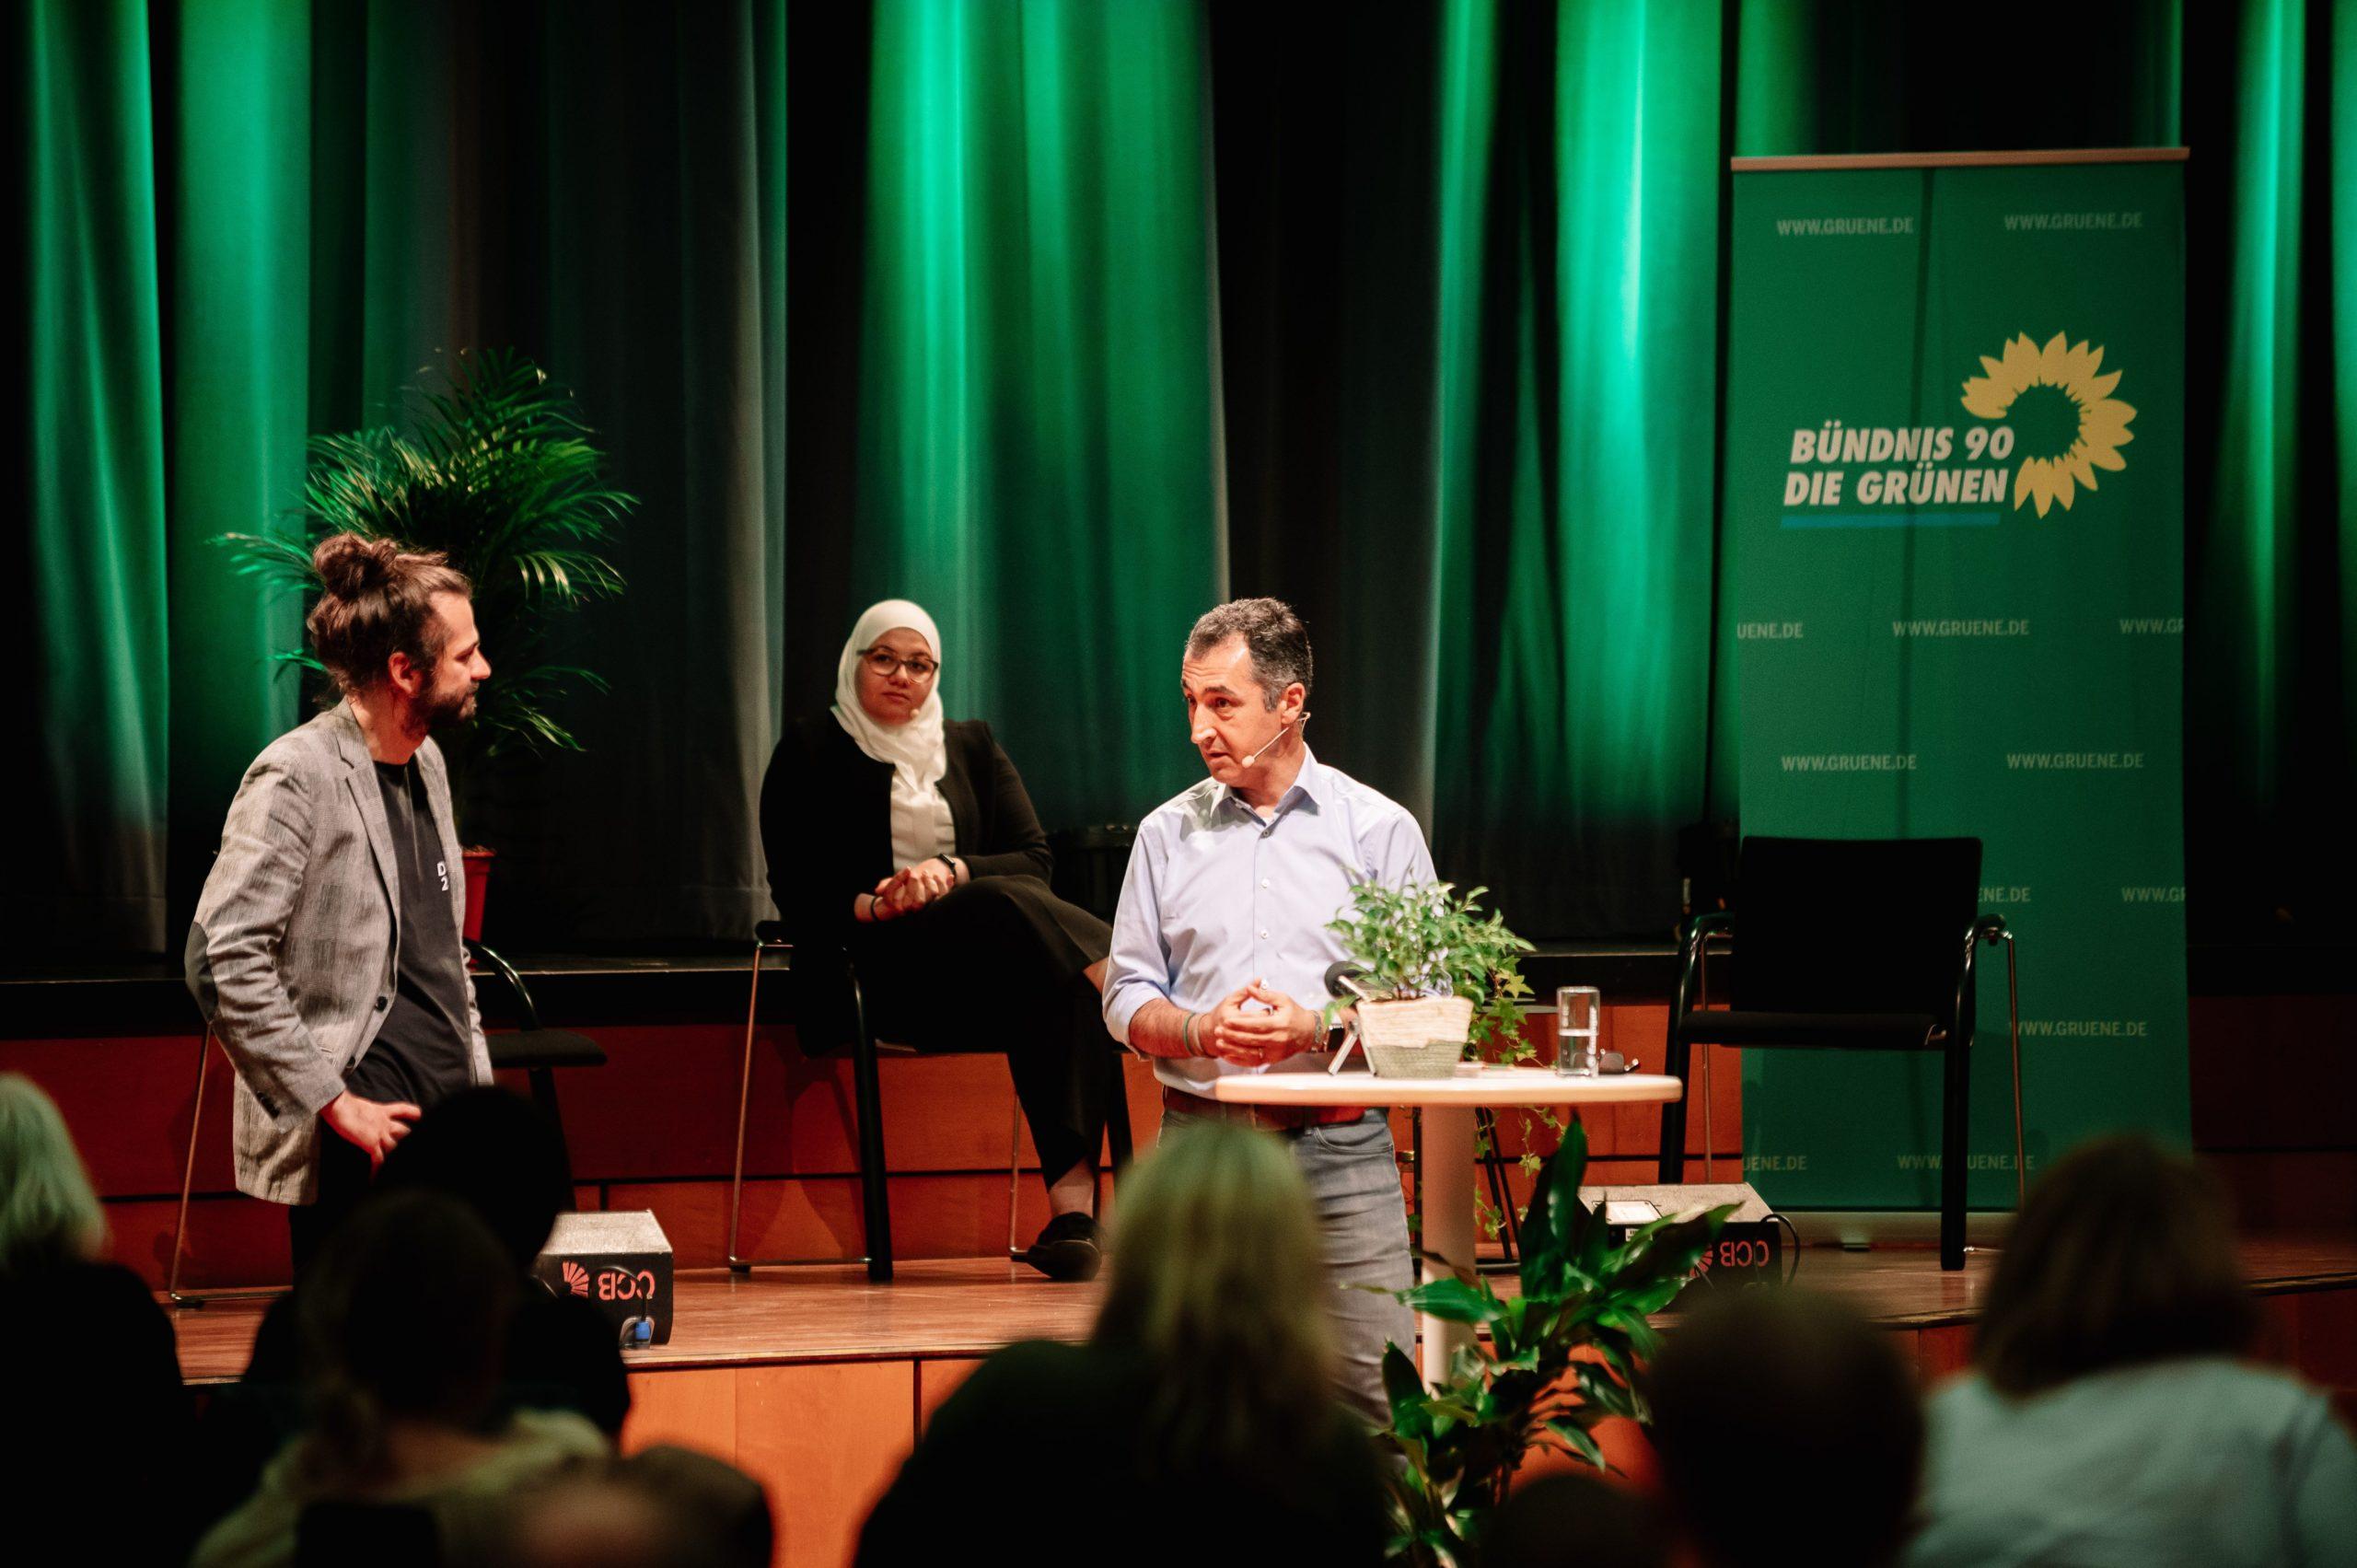 Cem Özdemir: Grüner Klimaschutz sichert Arbeitsplätze